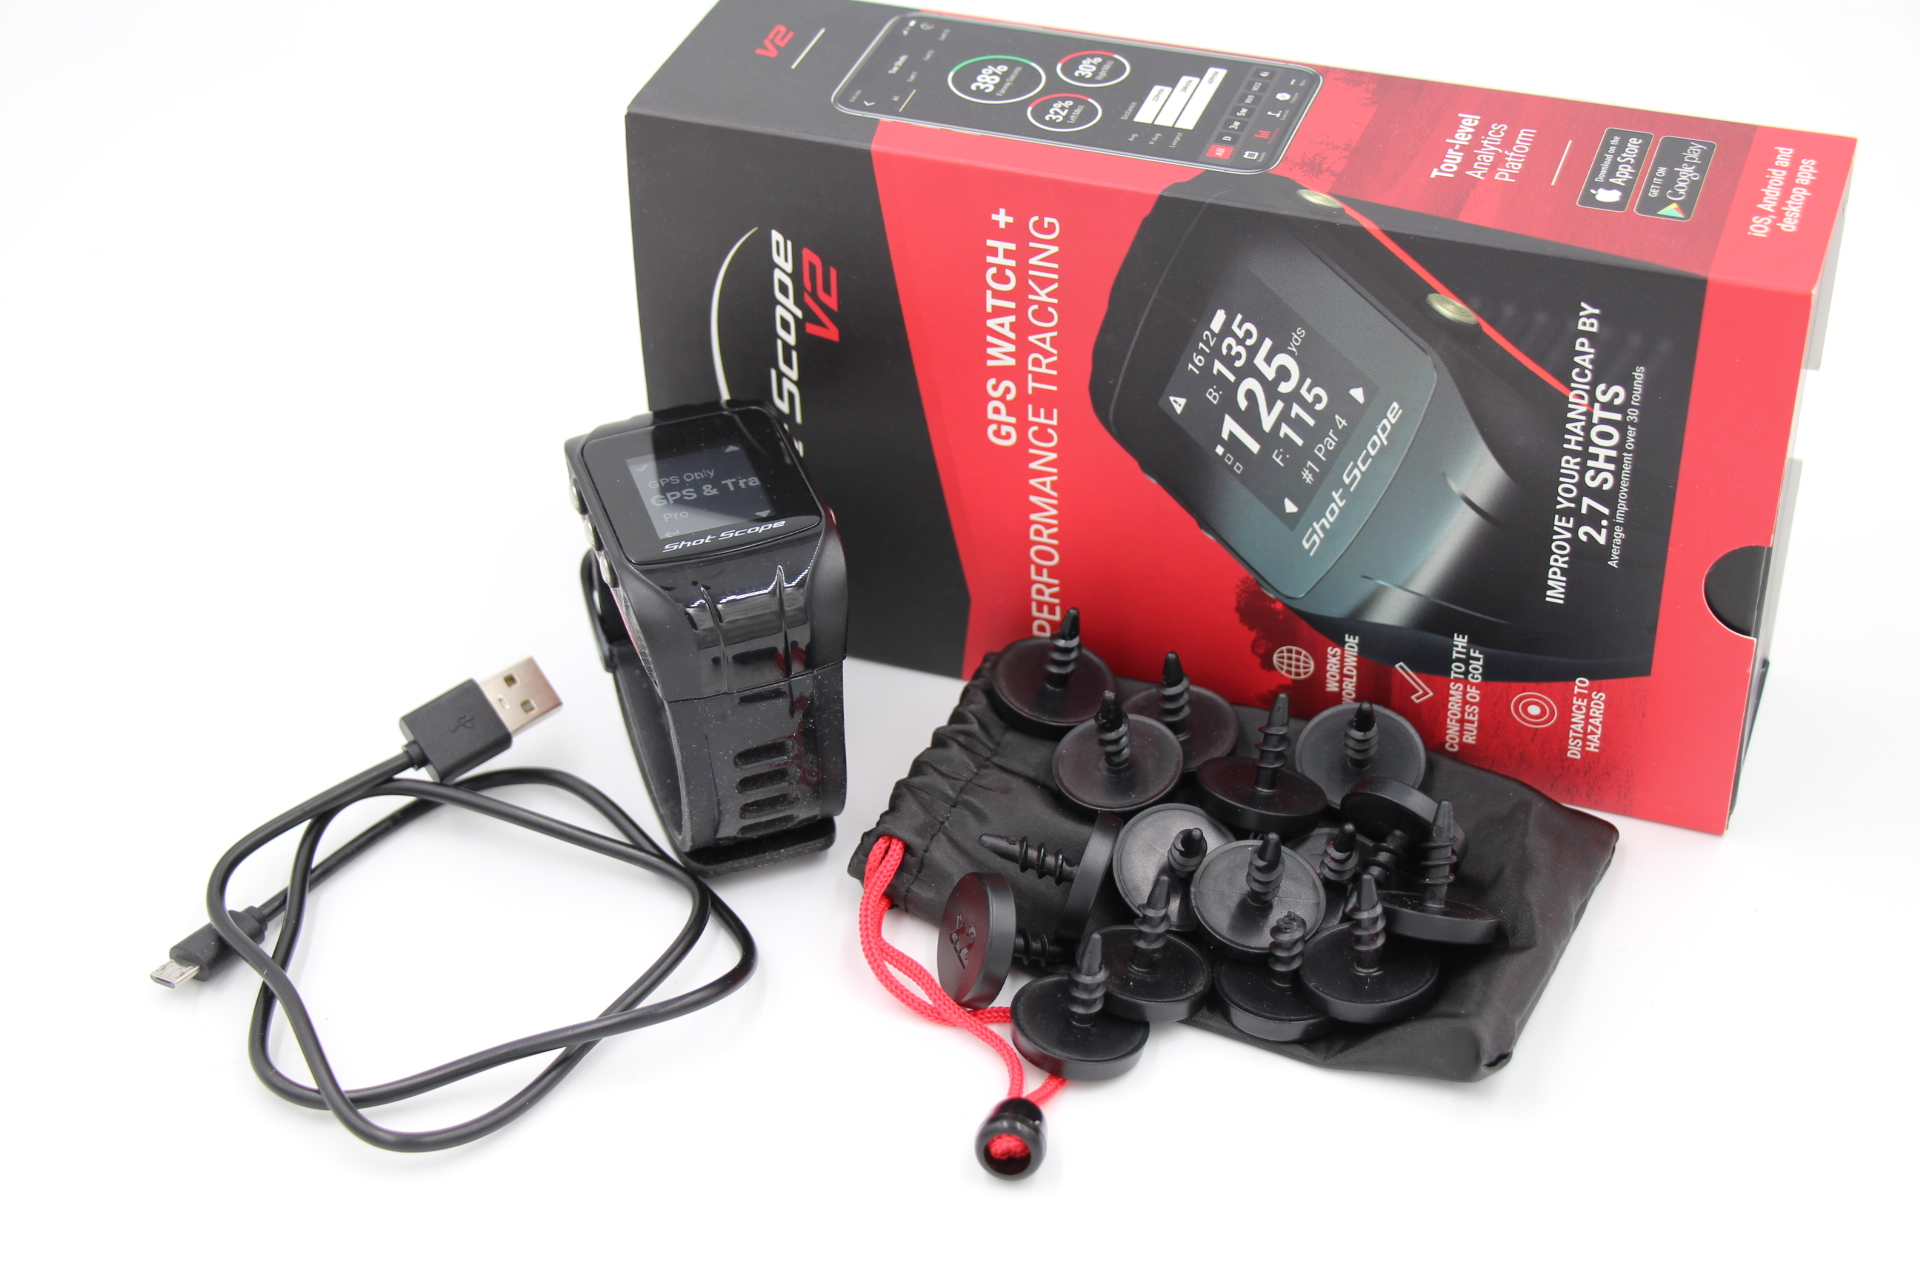 Shot Scope V2 GPS Watch & Performance Tracker